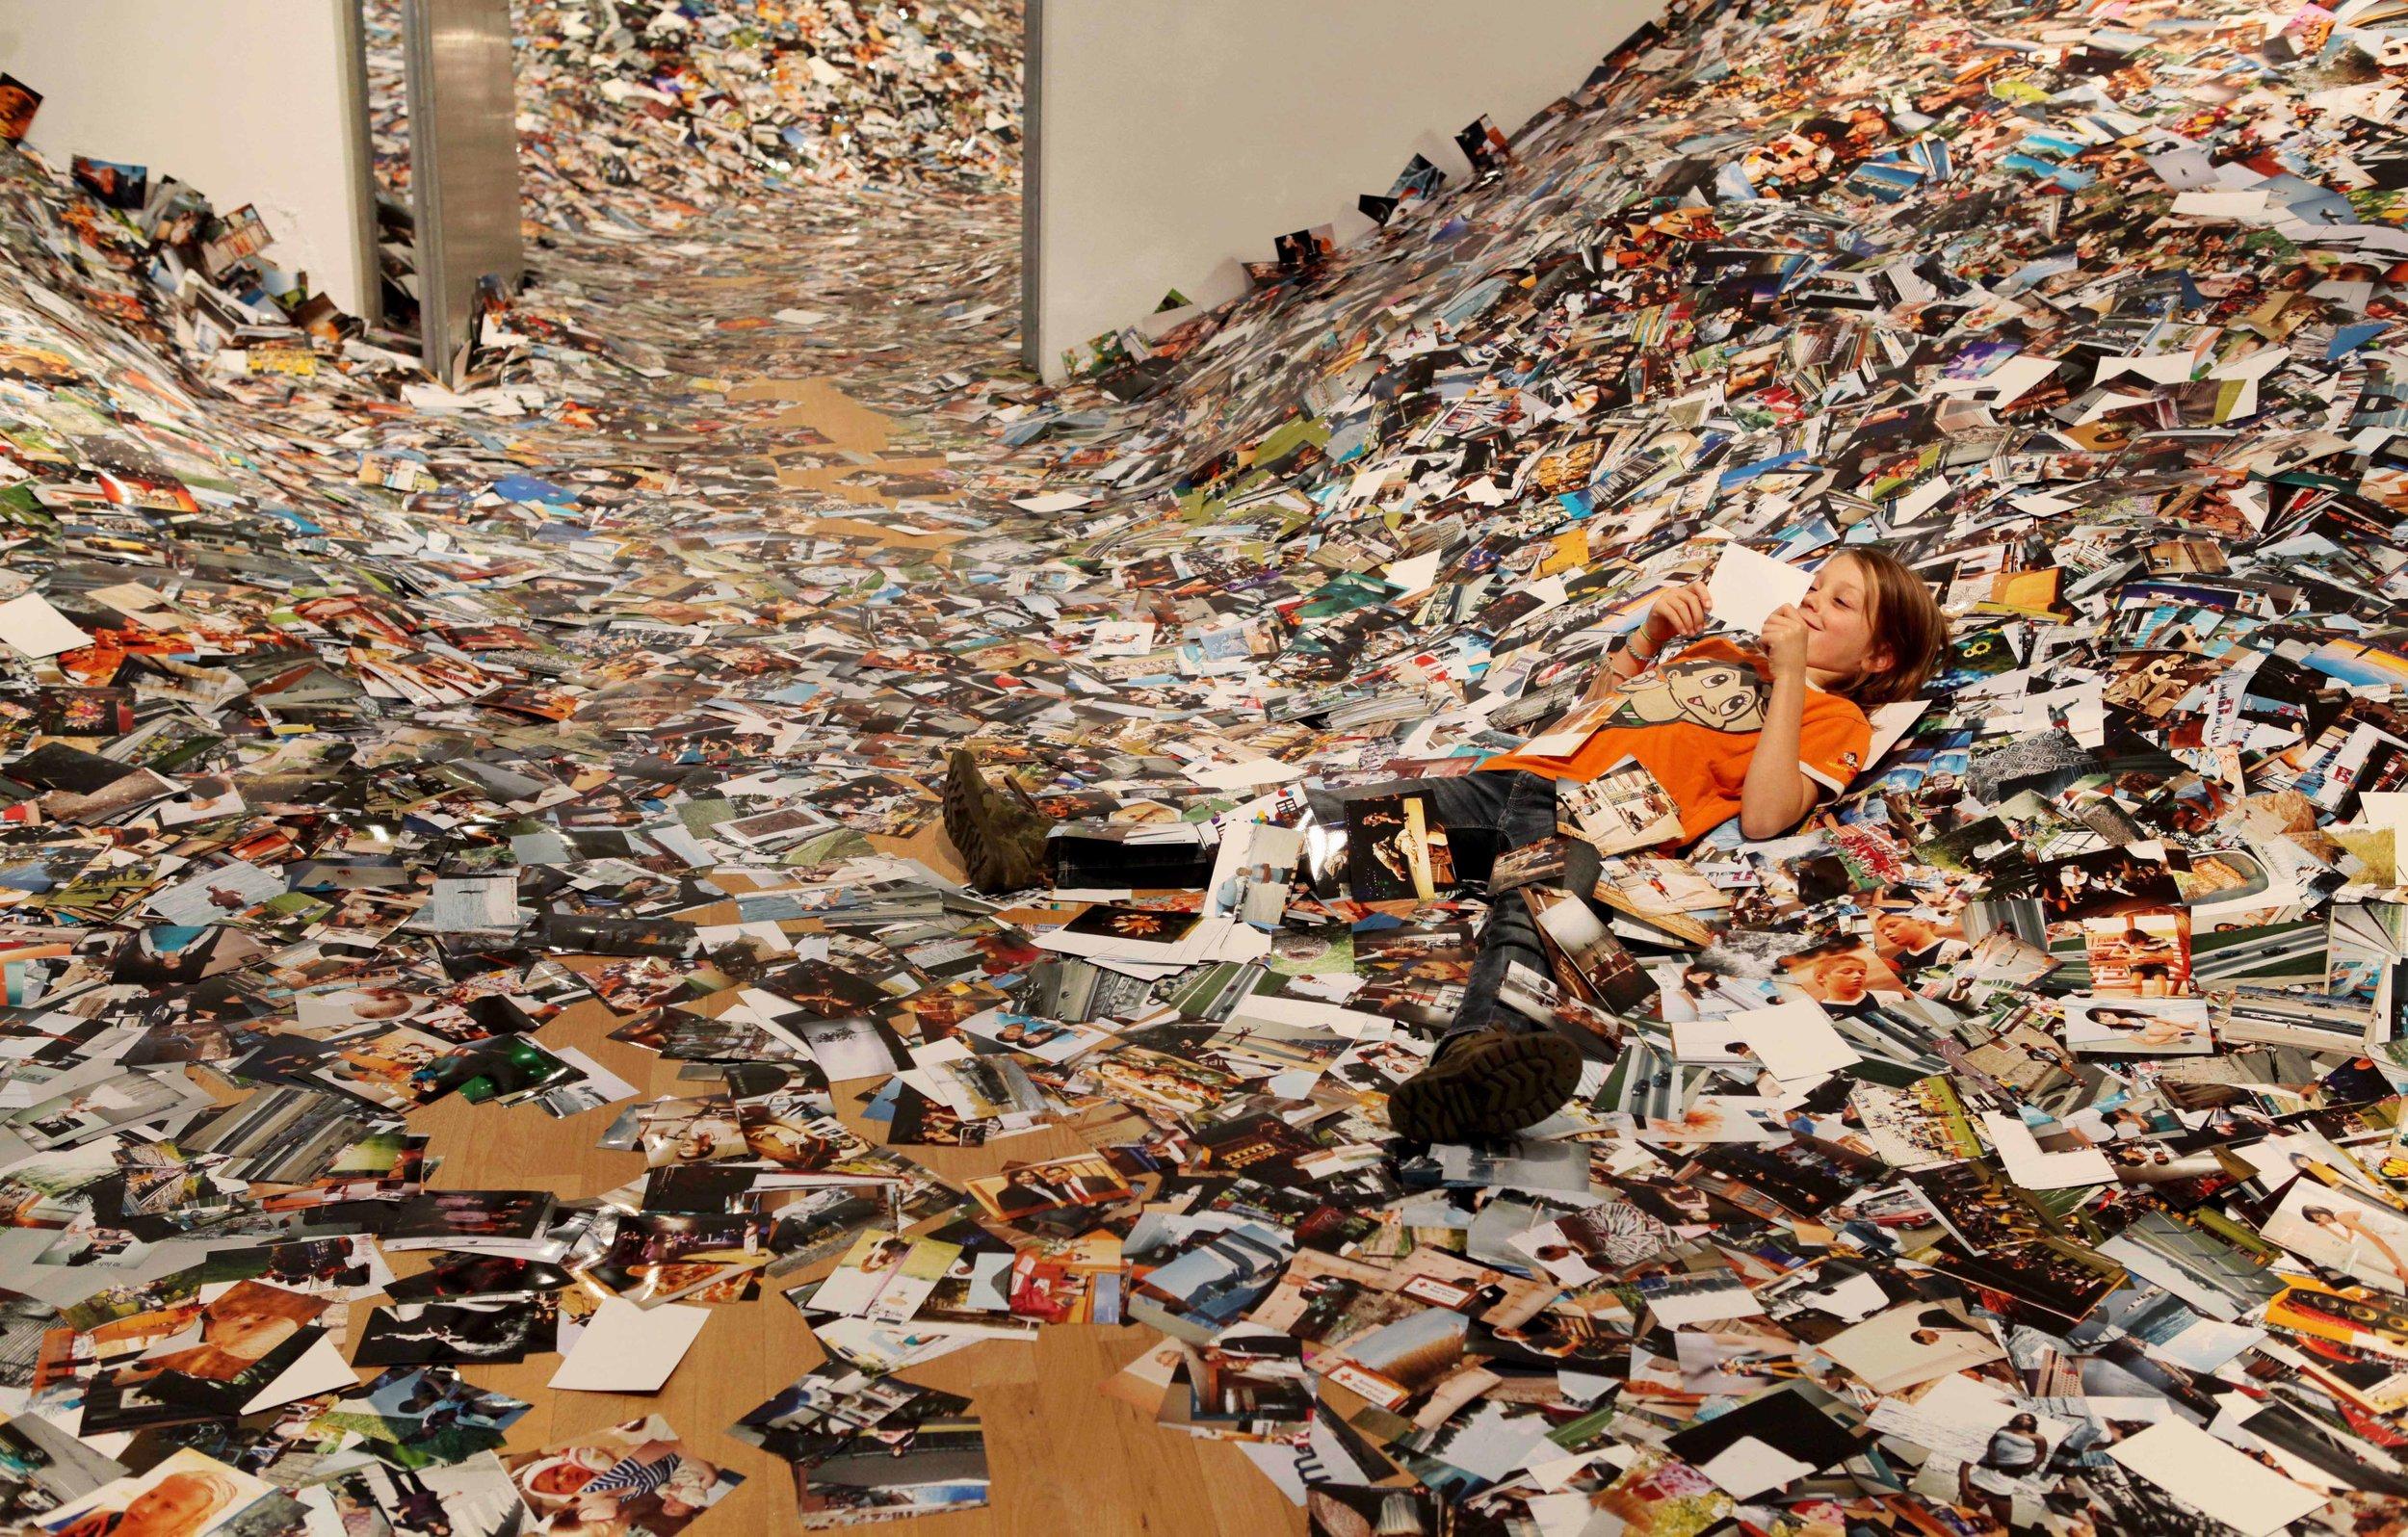 02 Exhibition - 24hrs of Photos - Erik Kessels.jpg